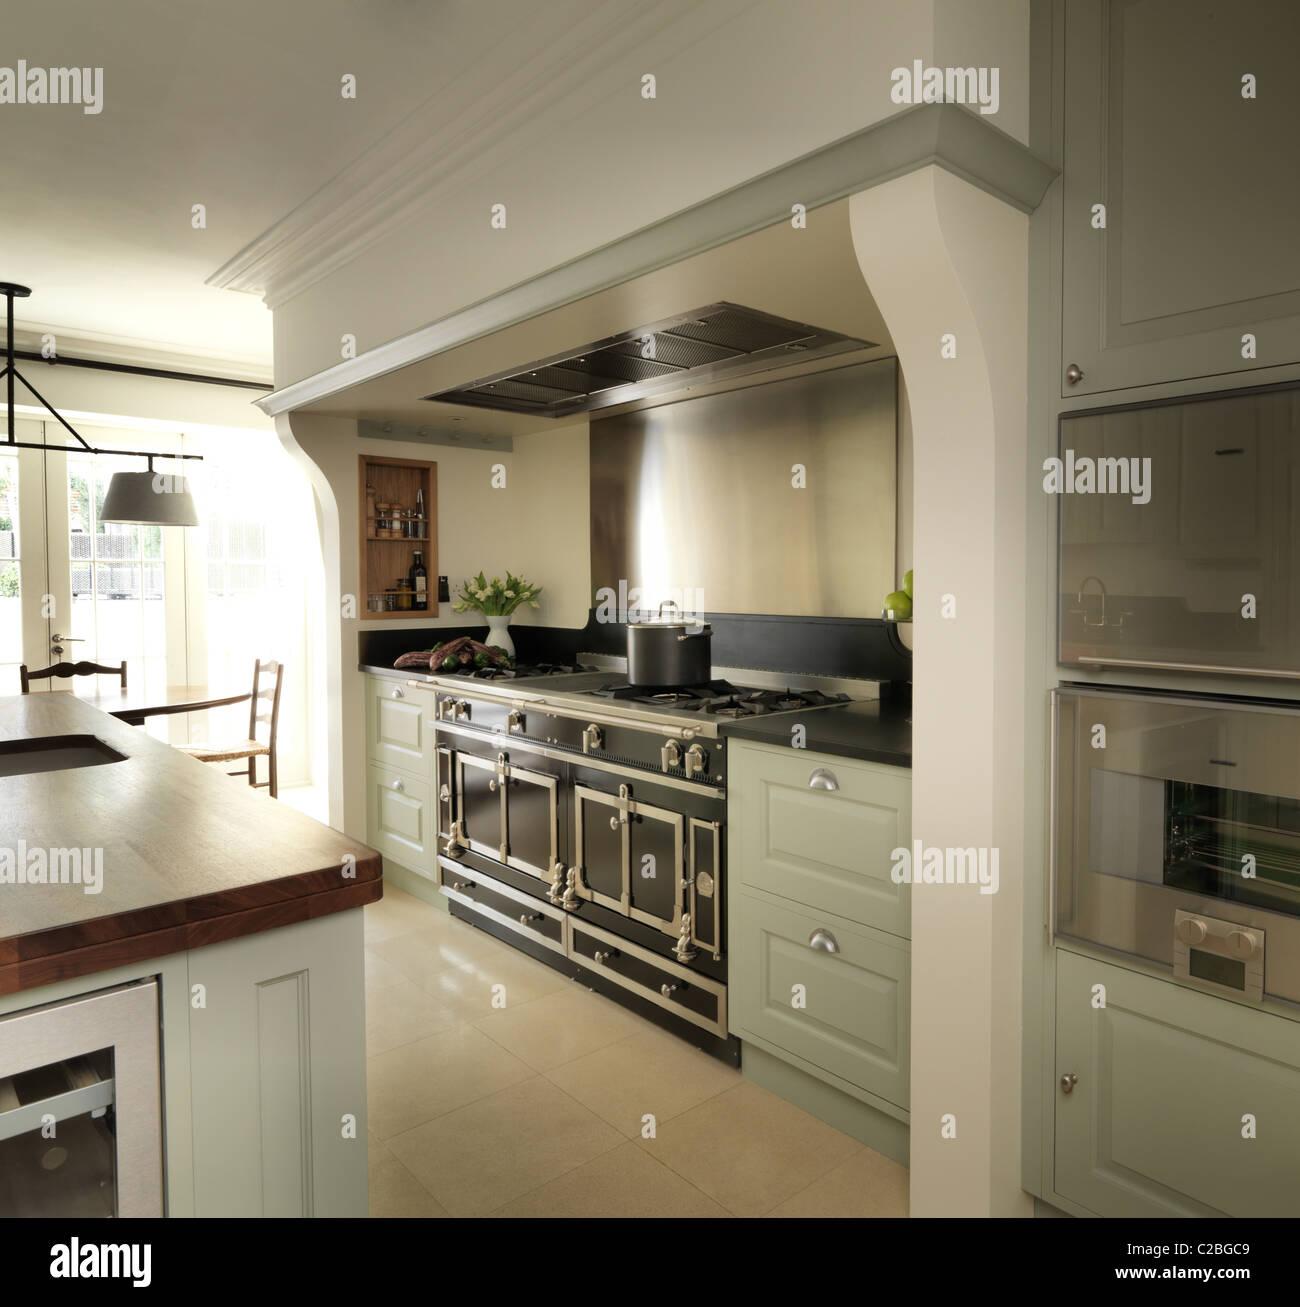 Custom Designed Stockfotos & Custom Designed Bilder - Alamy